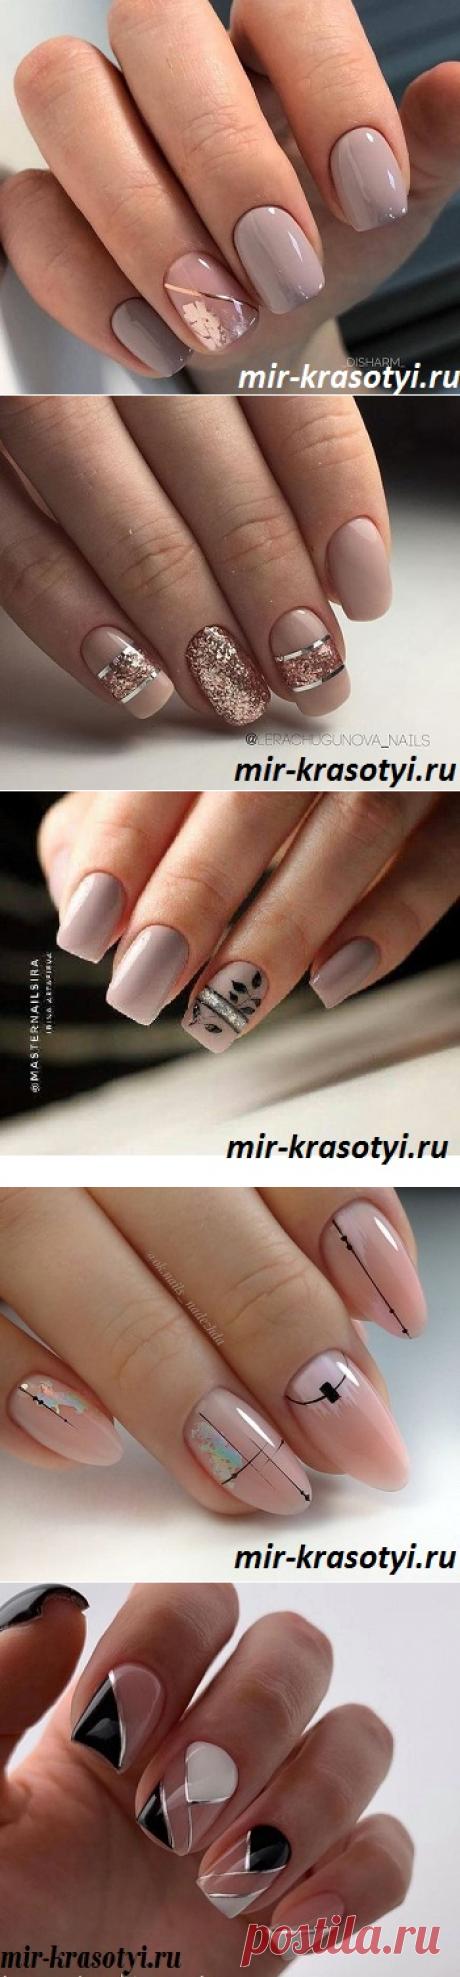 Дизайн ногтей осень зима 2019-2020 фото